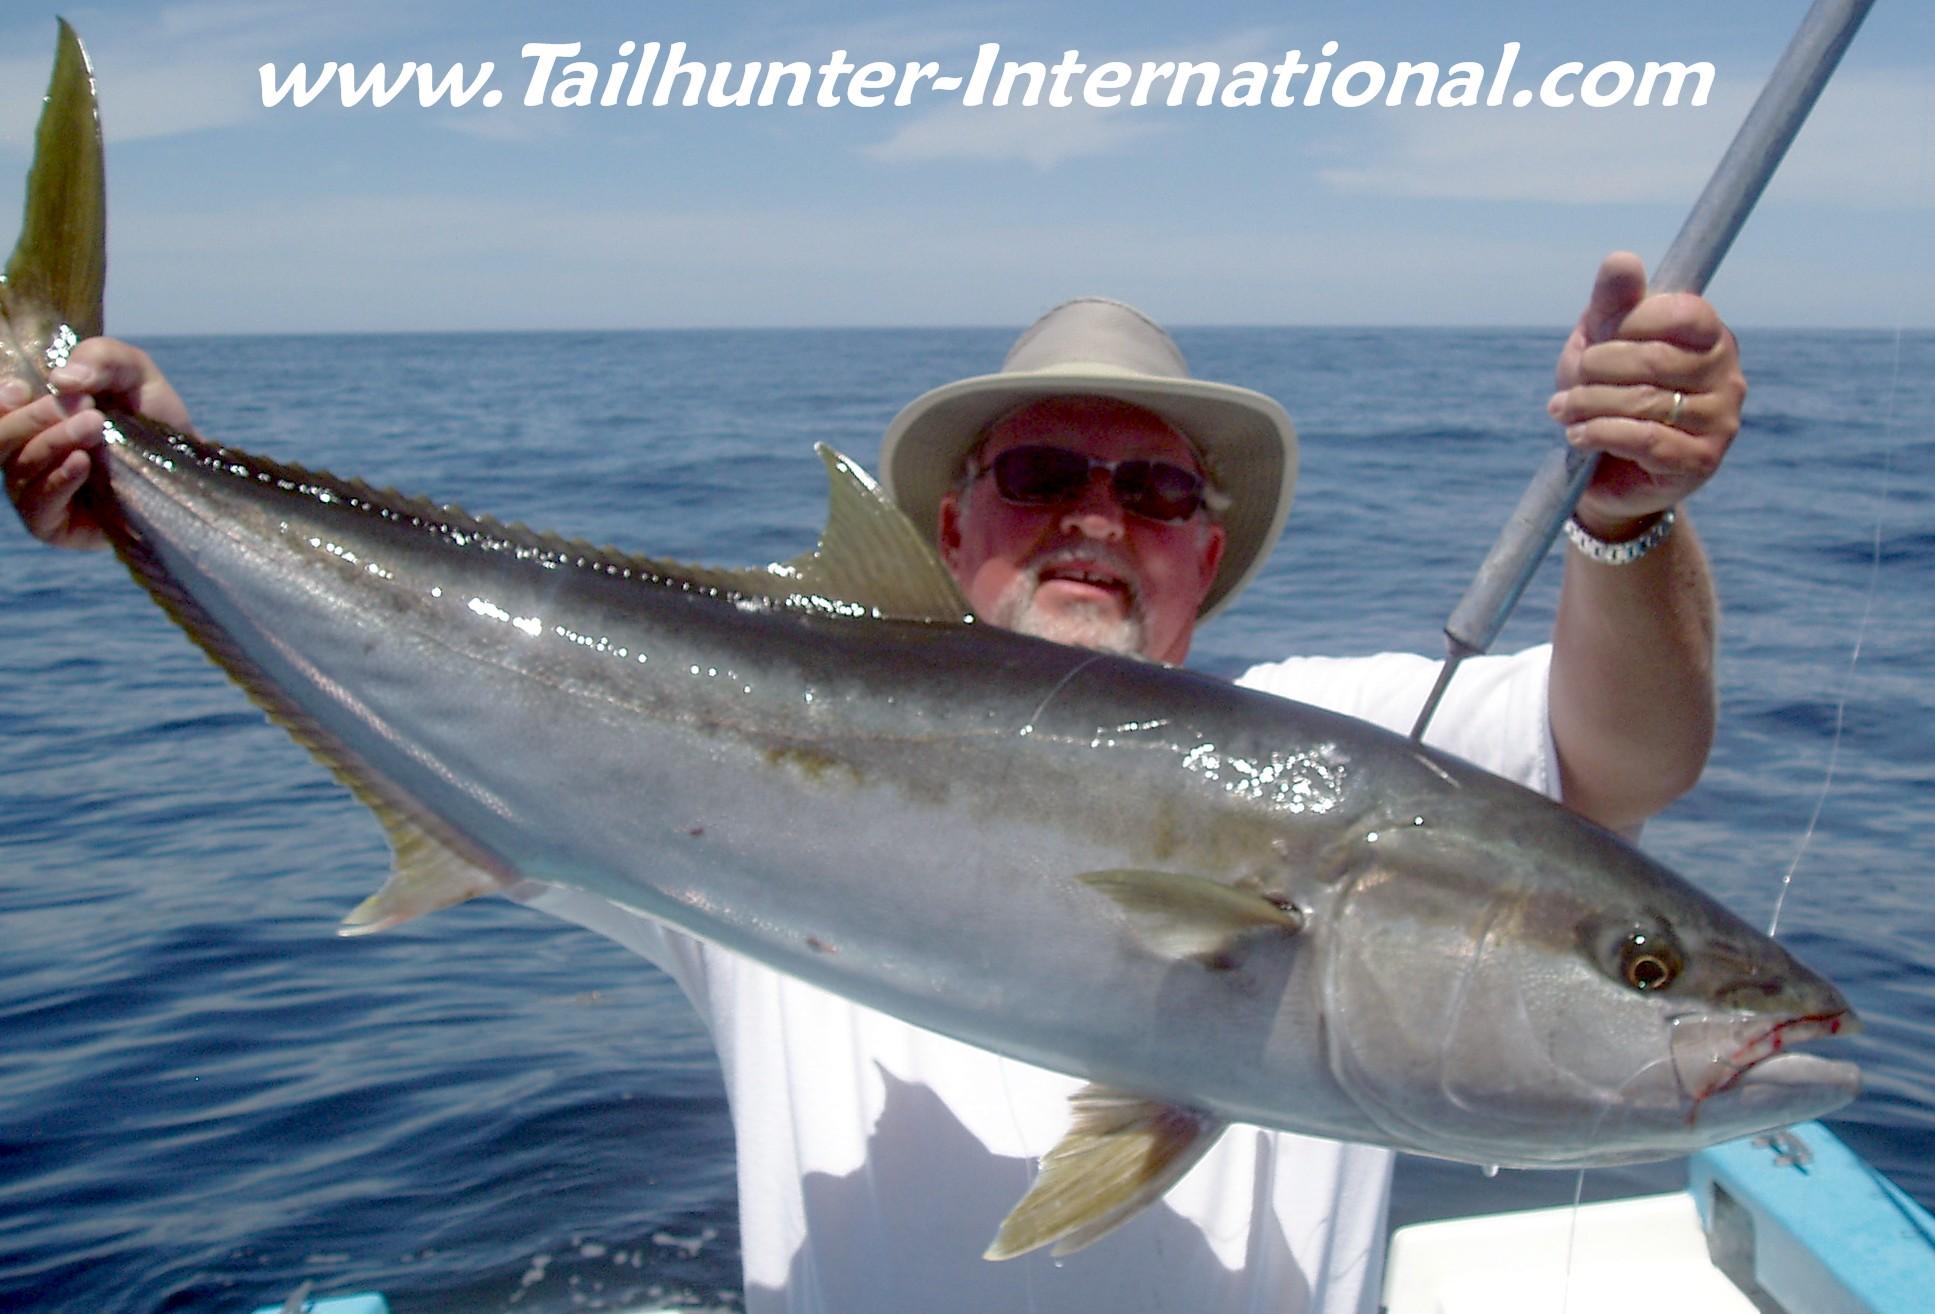 Tailhunter La Paz/Las Arenas April 16th, 2011 Fleet Report ...